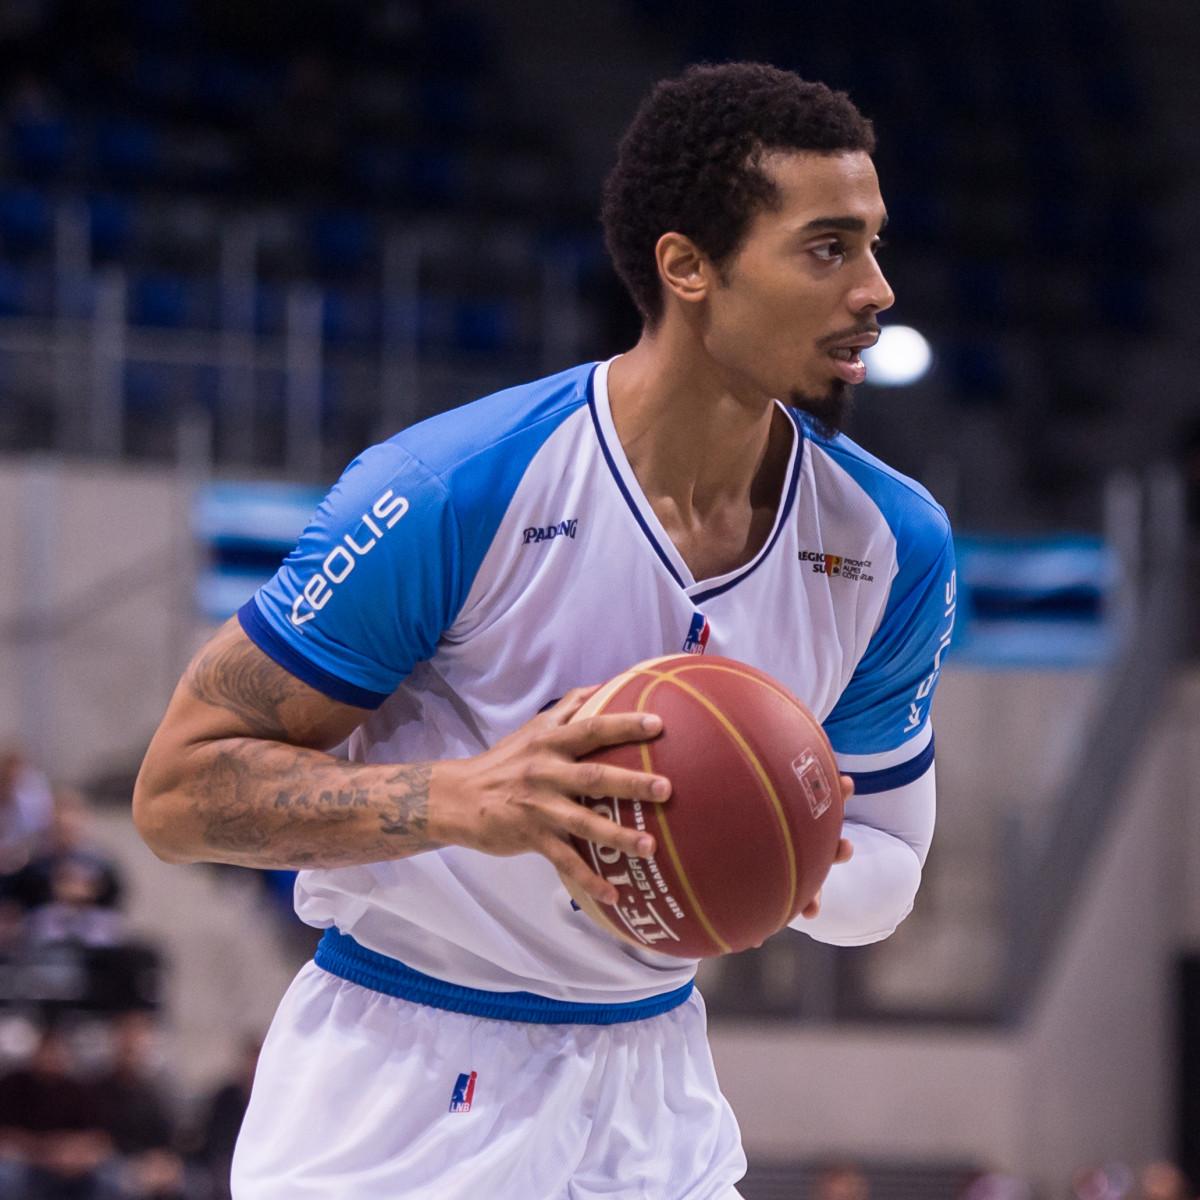 Photo of Fernando Raposo, 2019-2020 season